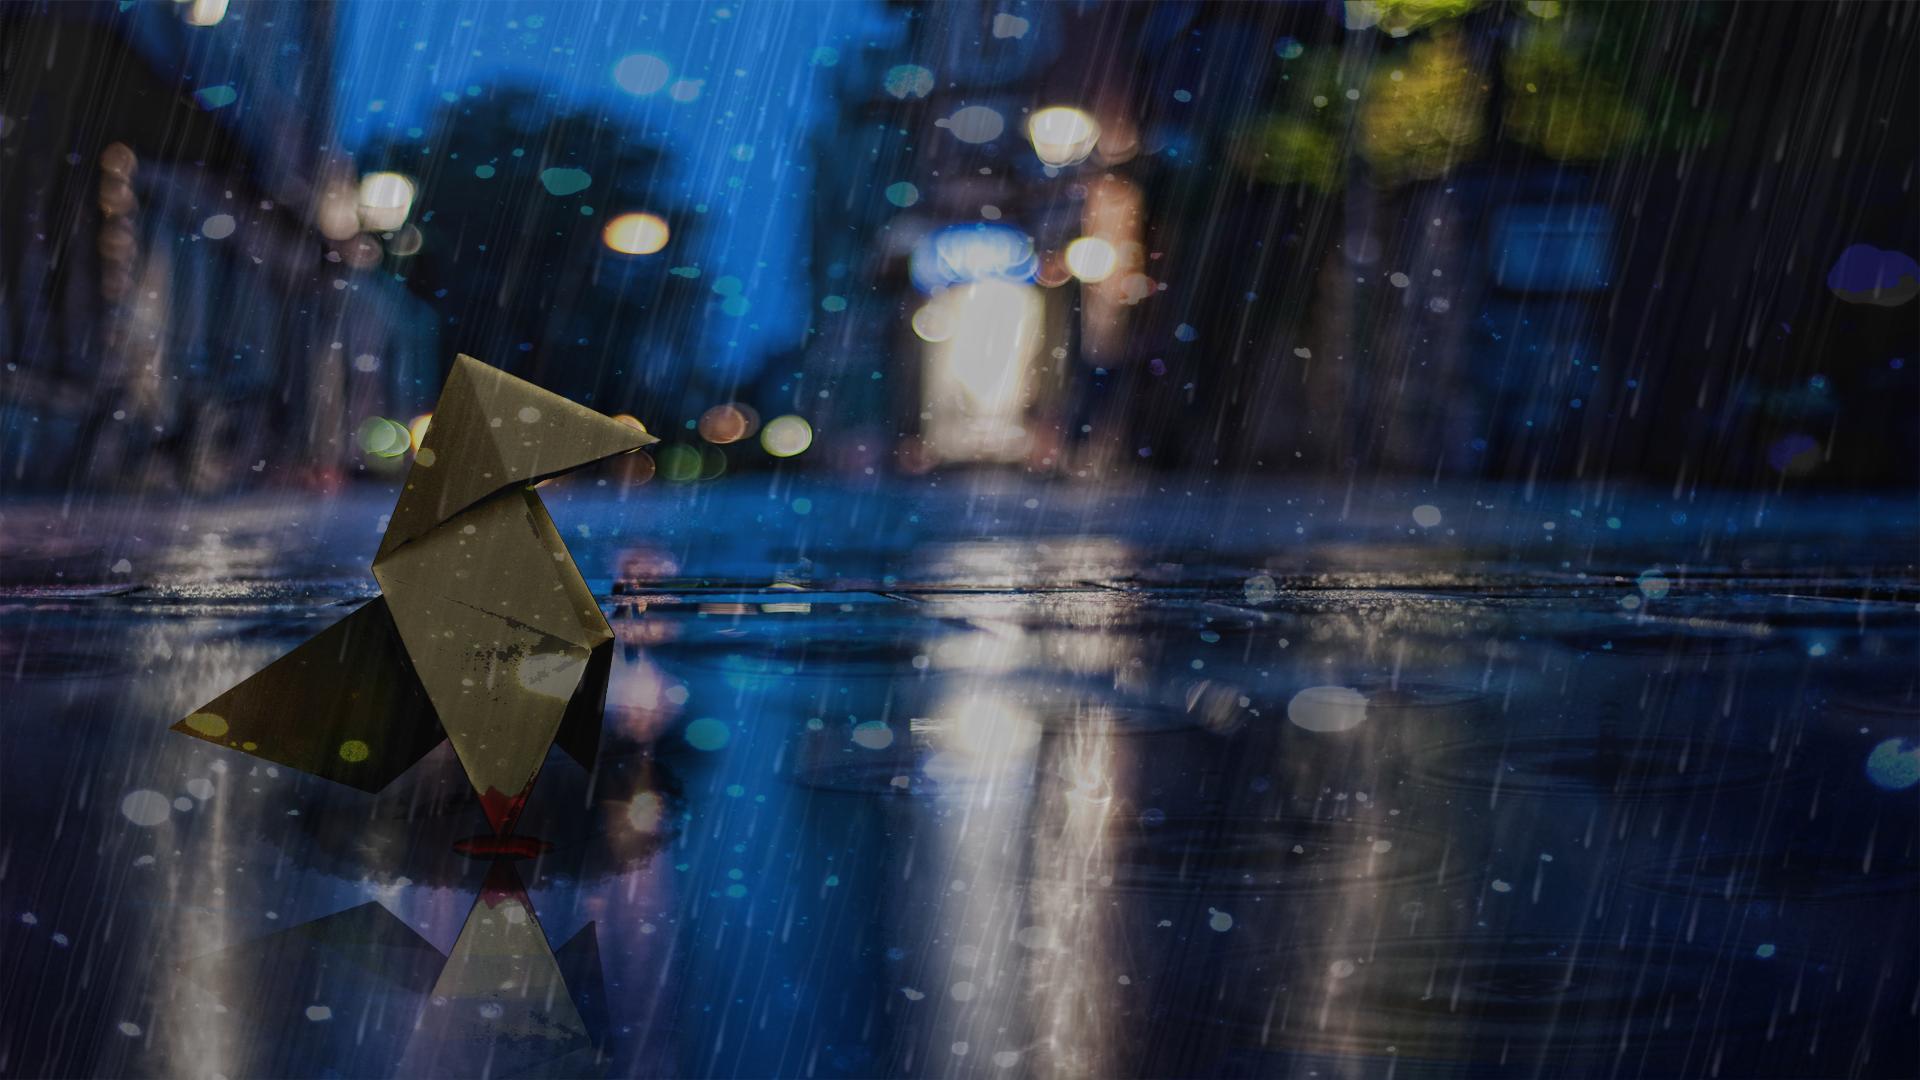 Hd wallpaper rain - Amazing Rainy Nature Wallpapers